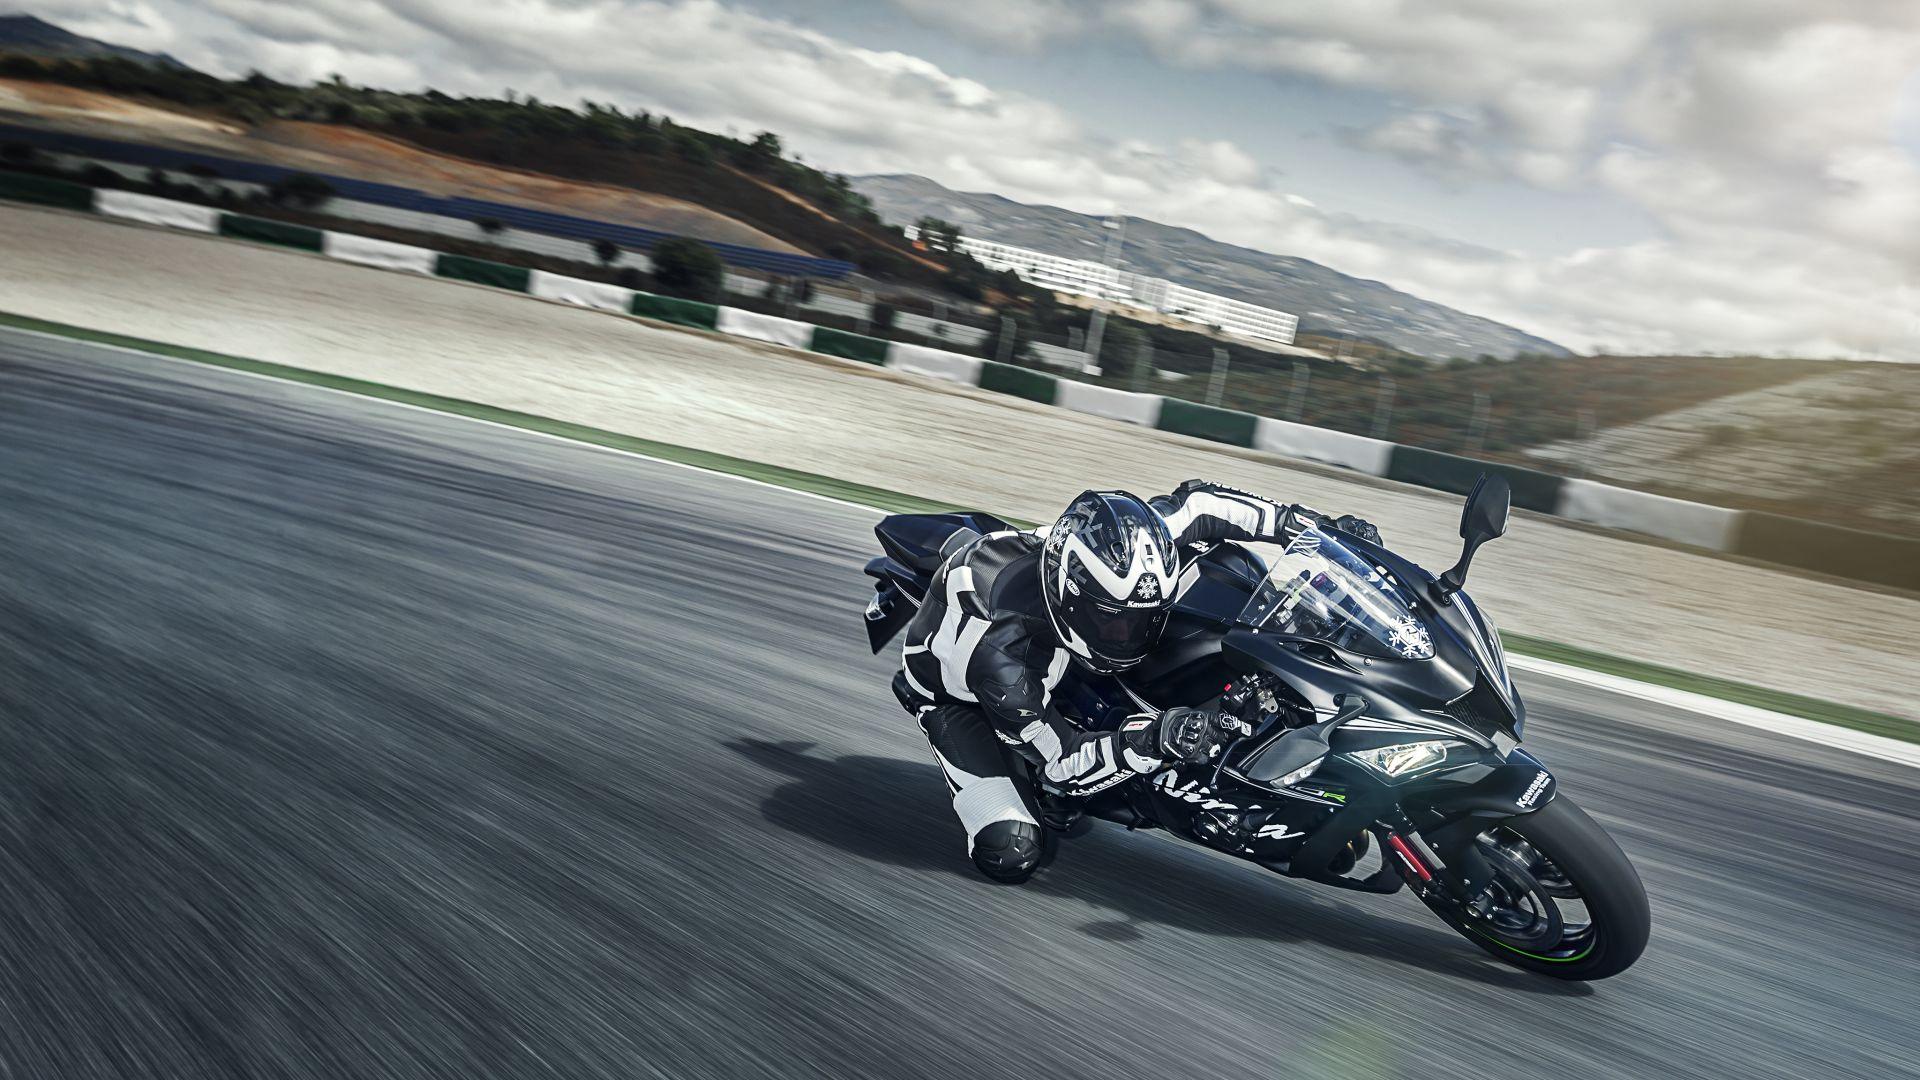 Kawasaki Ninja Zx10r Best Bikes Motorcycle Horizontal